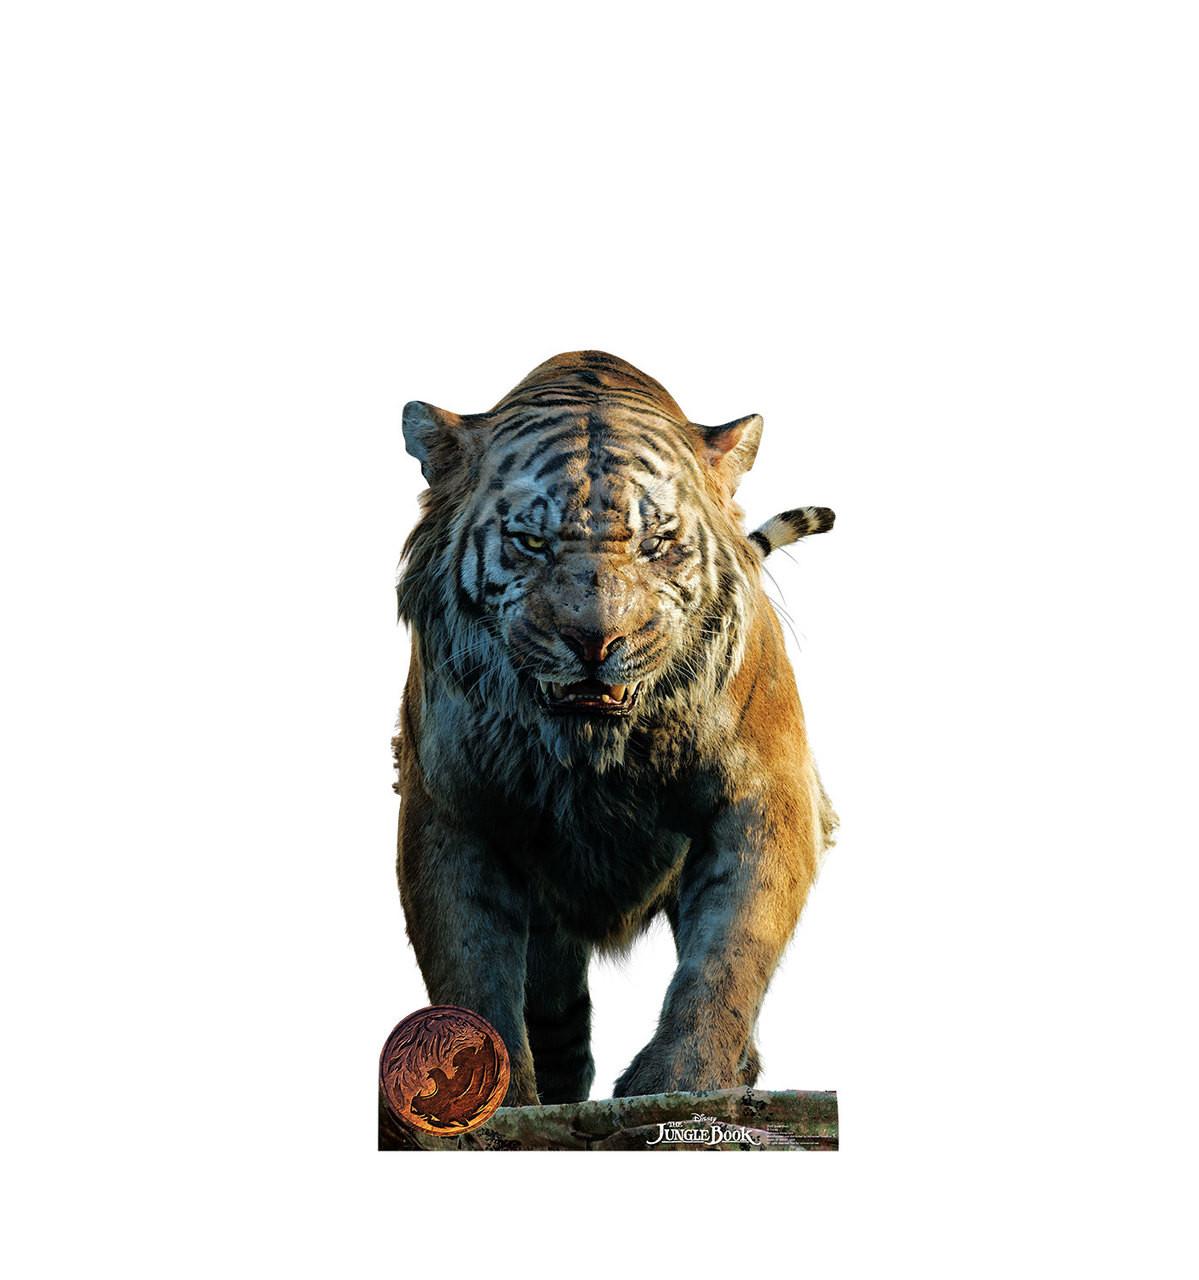 Life-size Shere Khan - The Jungle Book Cardboard Standup